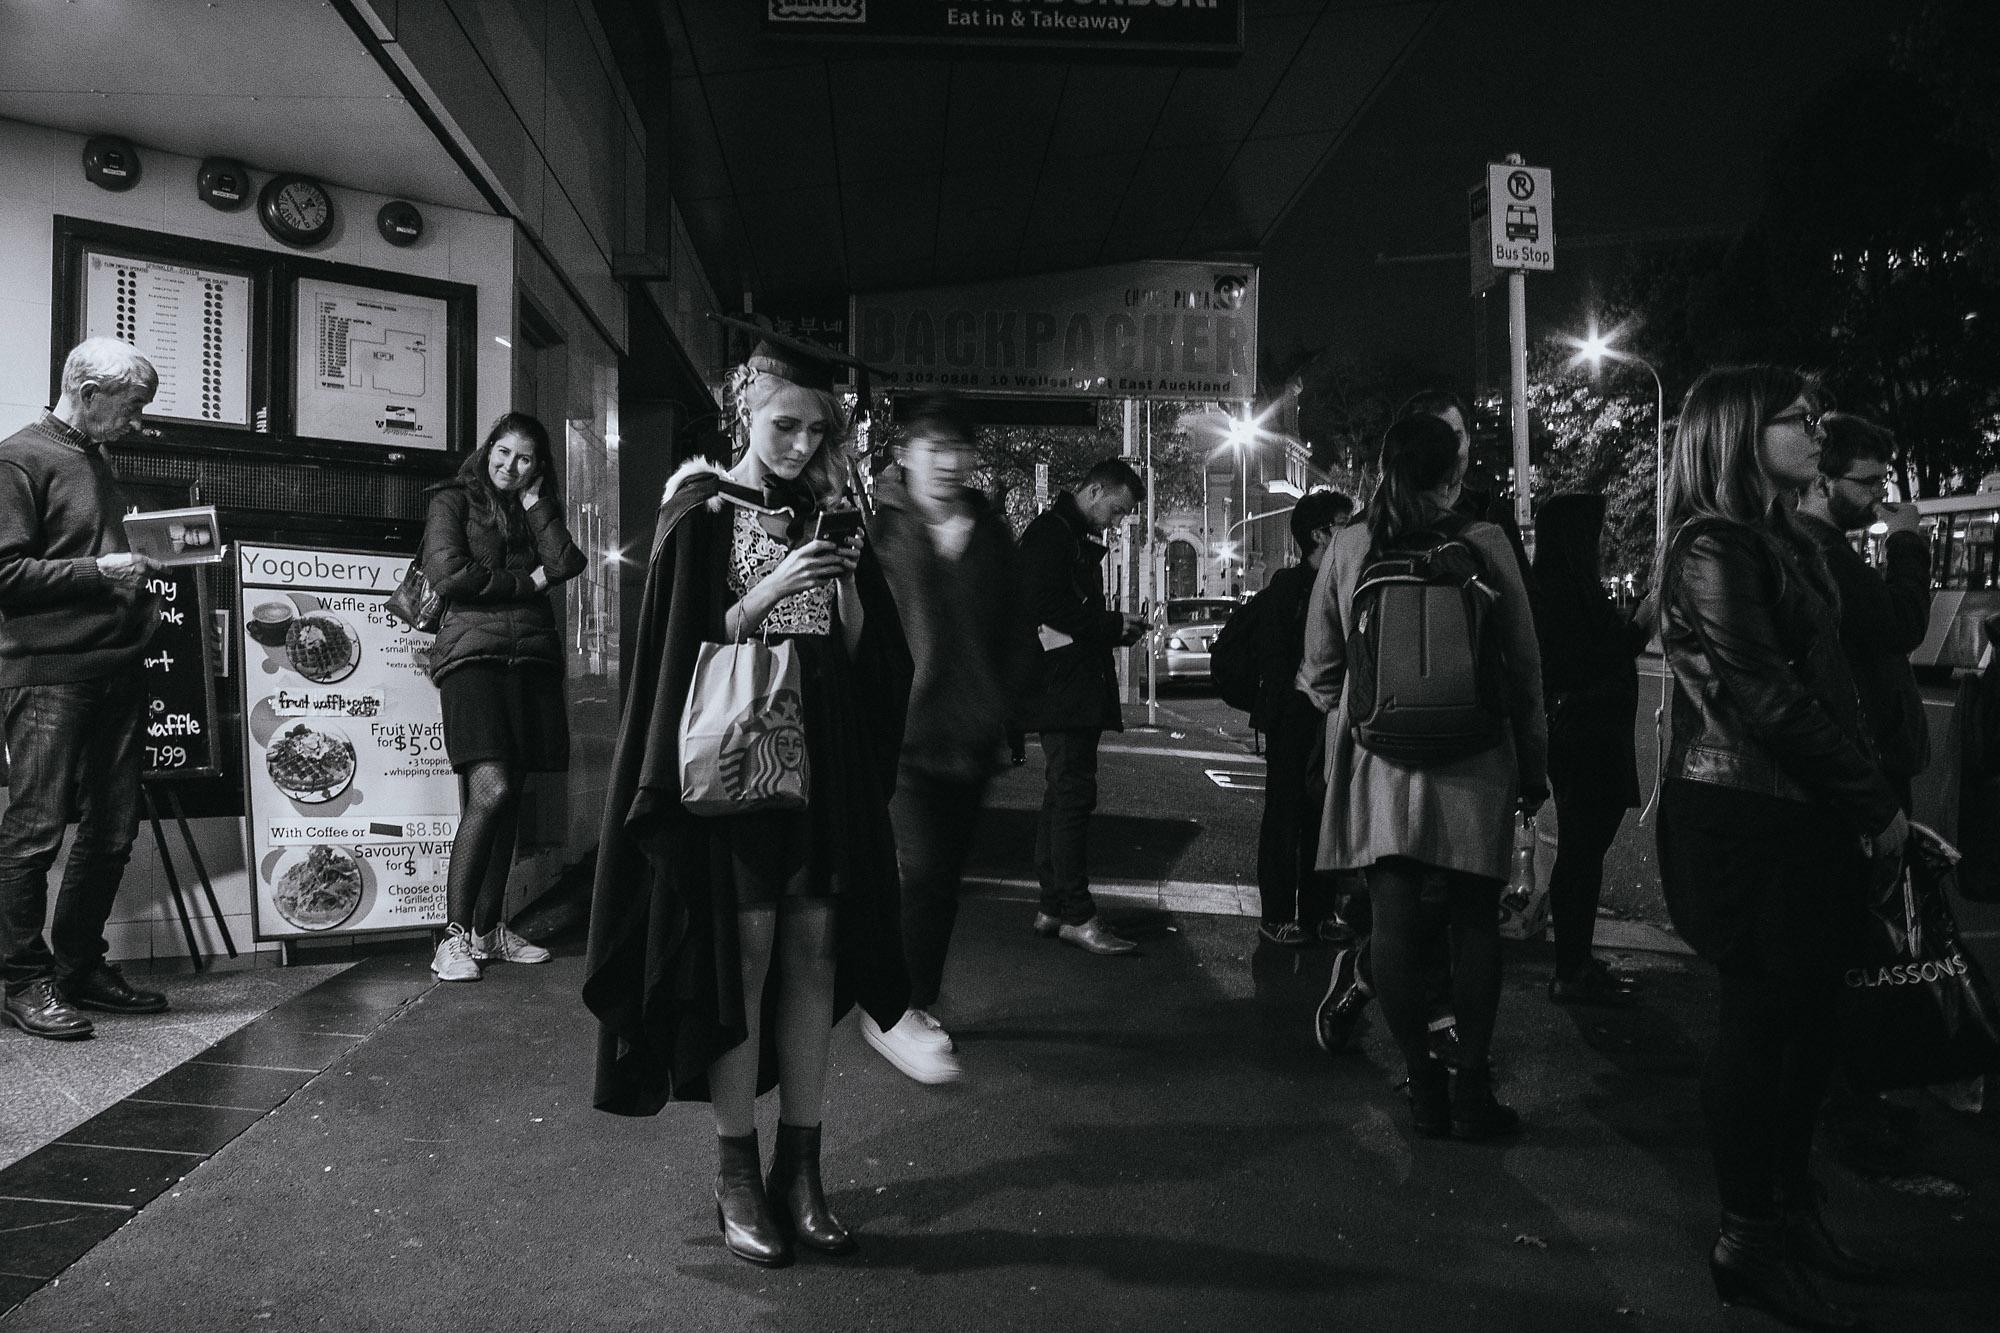 panasonic_lumix_cm1_review_15